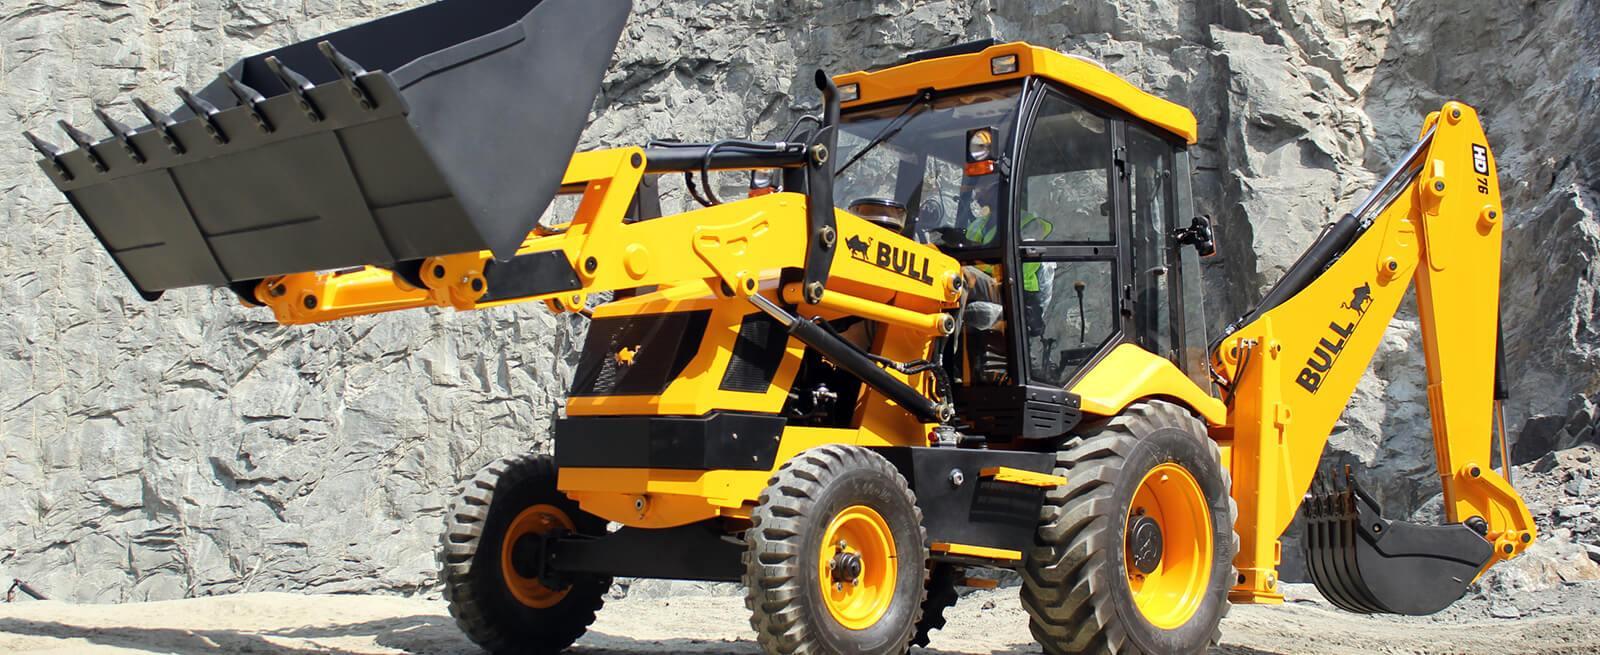 Bull HD 76 2WD | Construction Equipment | Backhoe Loader | Bull Machines